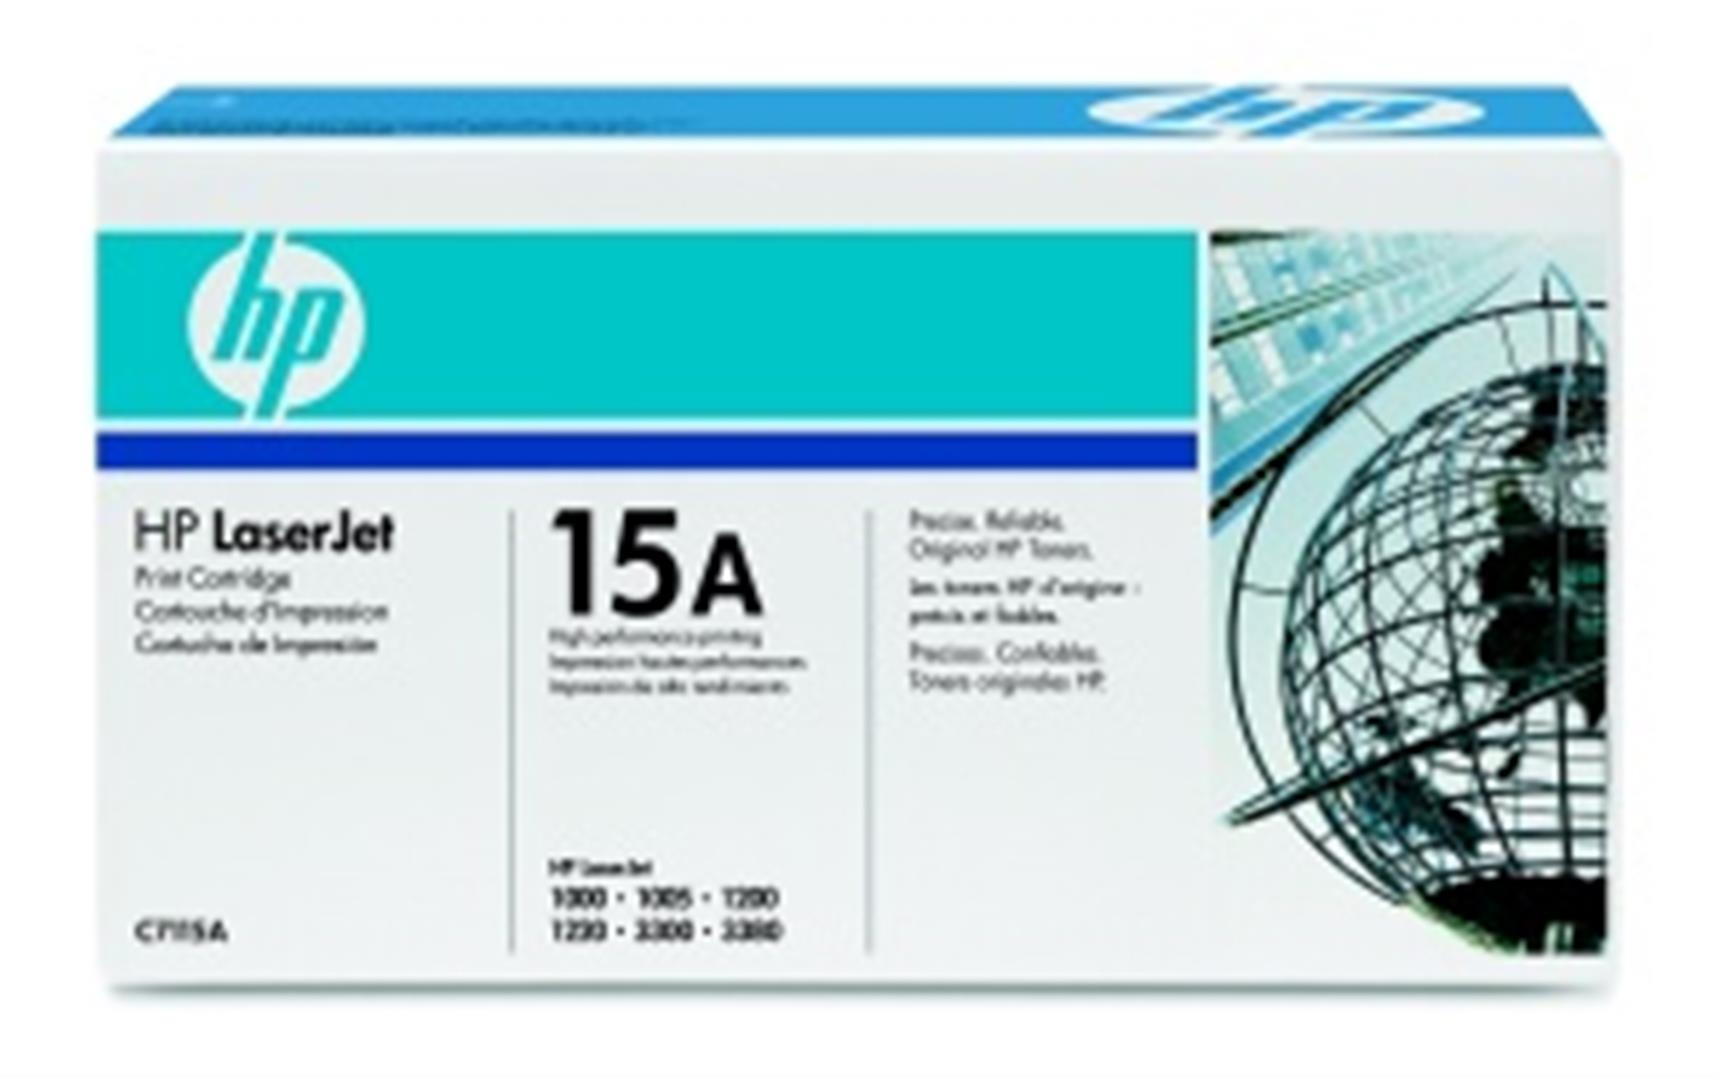 HP C7115A Toner 15A pro LJ 1200, 1220, 1000w, 33x0MFP, (2500str), Black